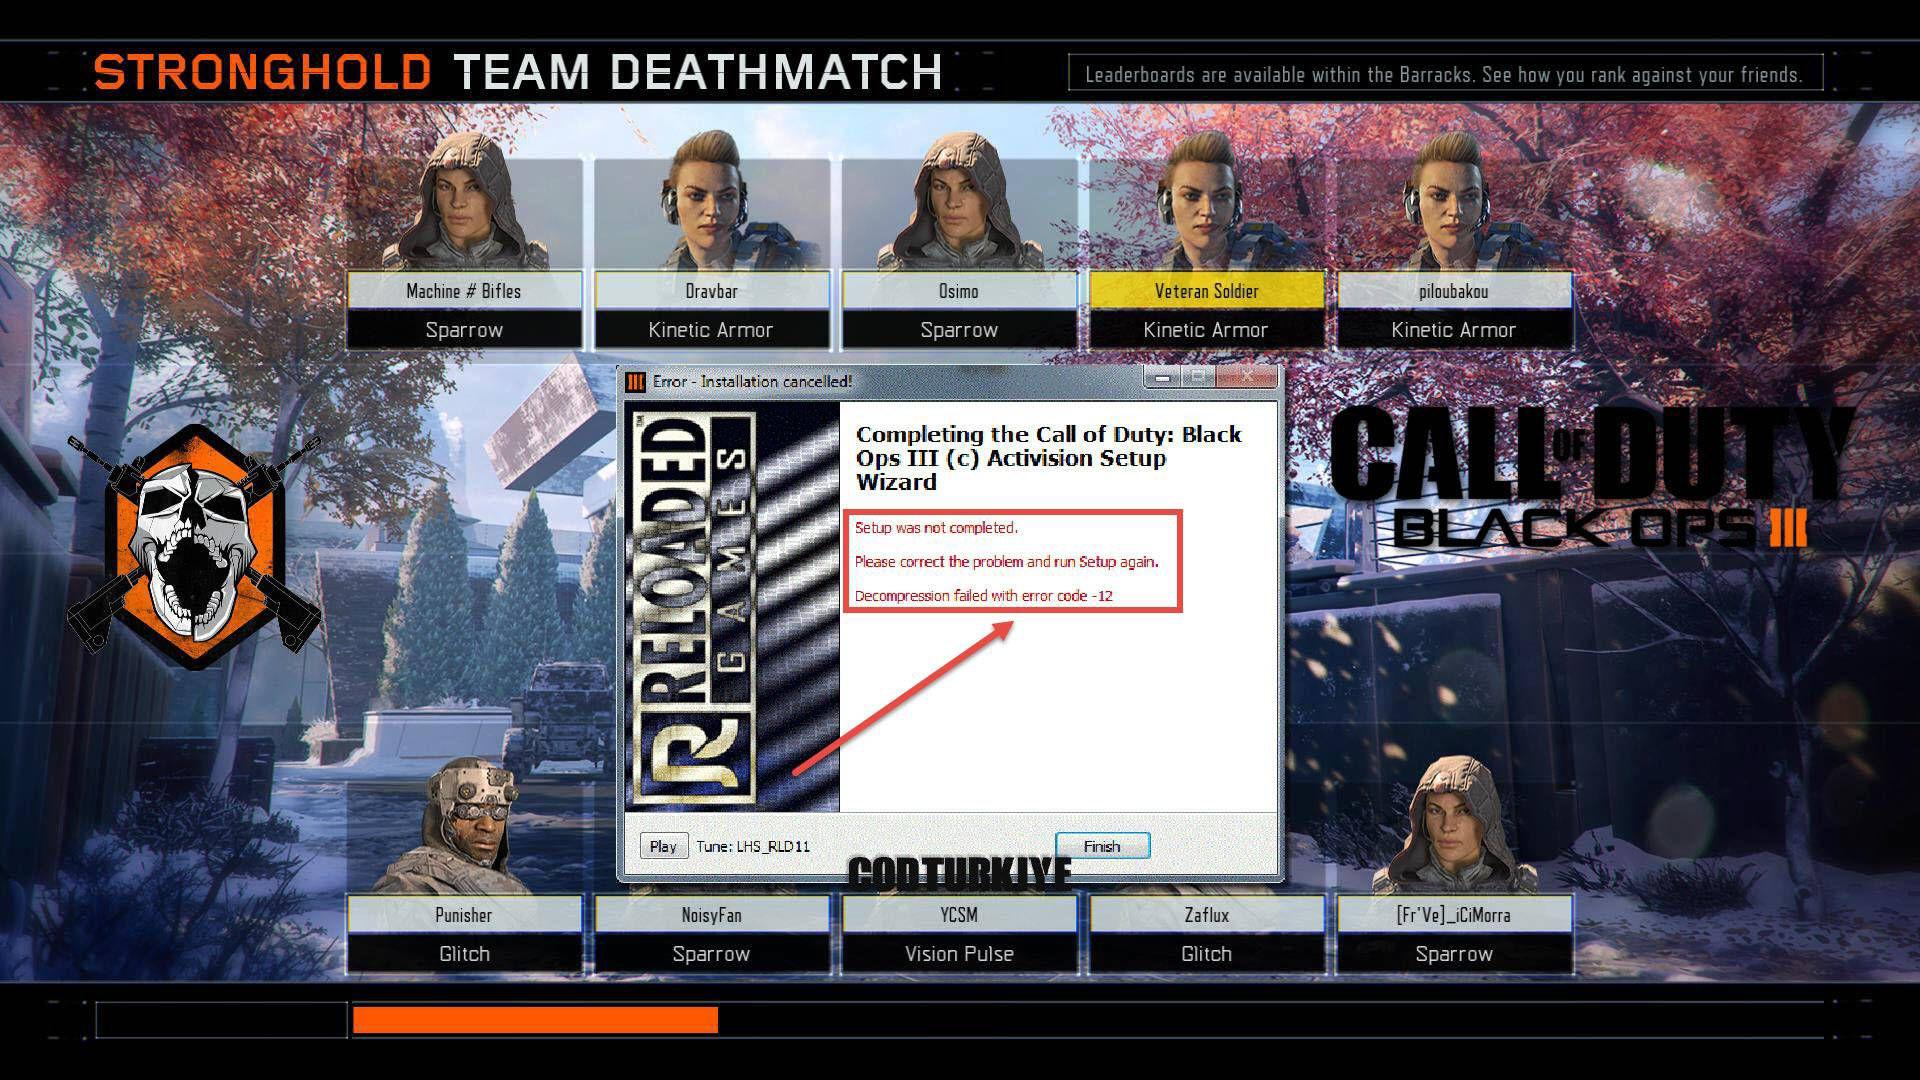 Black Ops 3 Decompression Failed Error